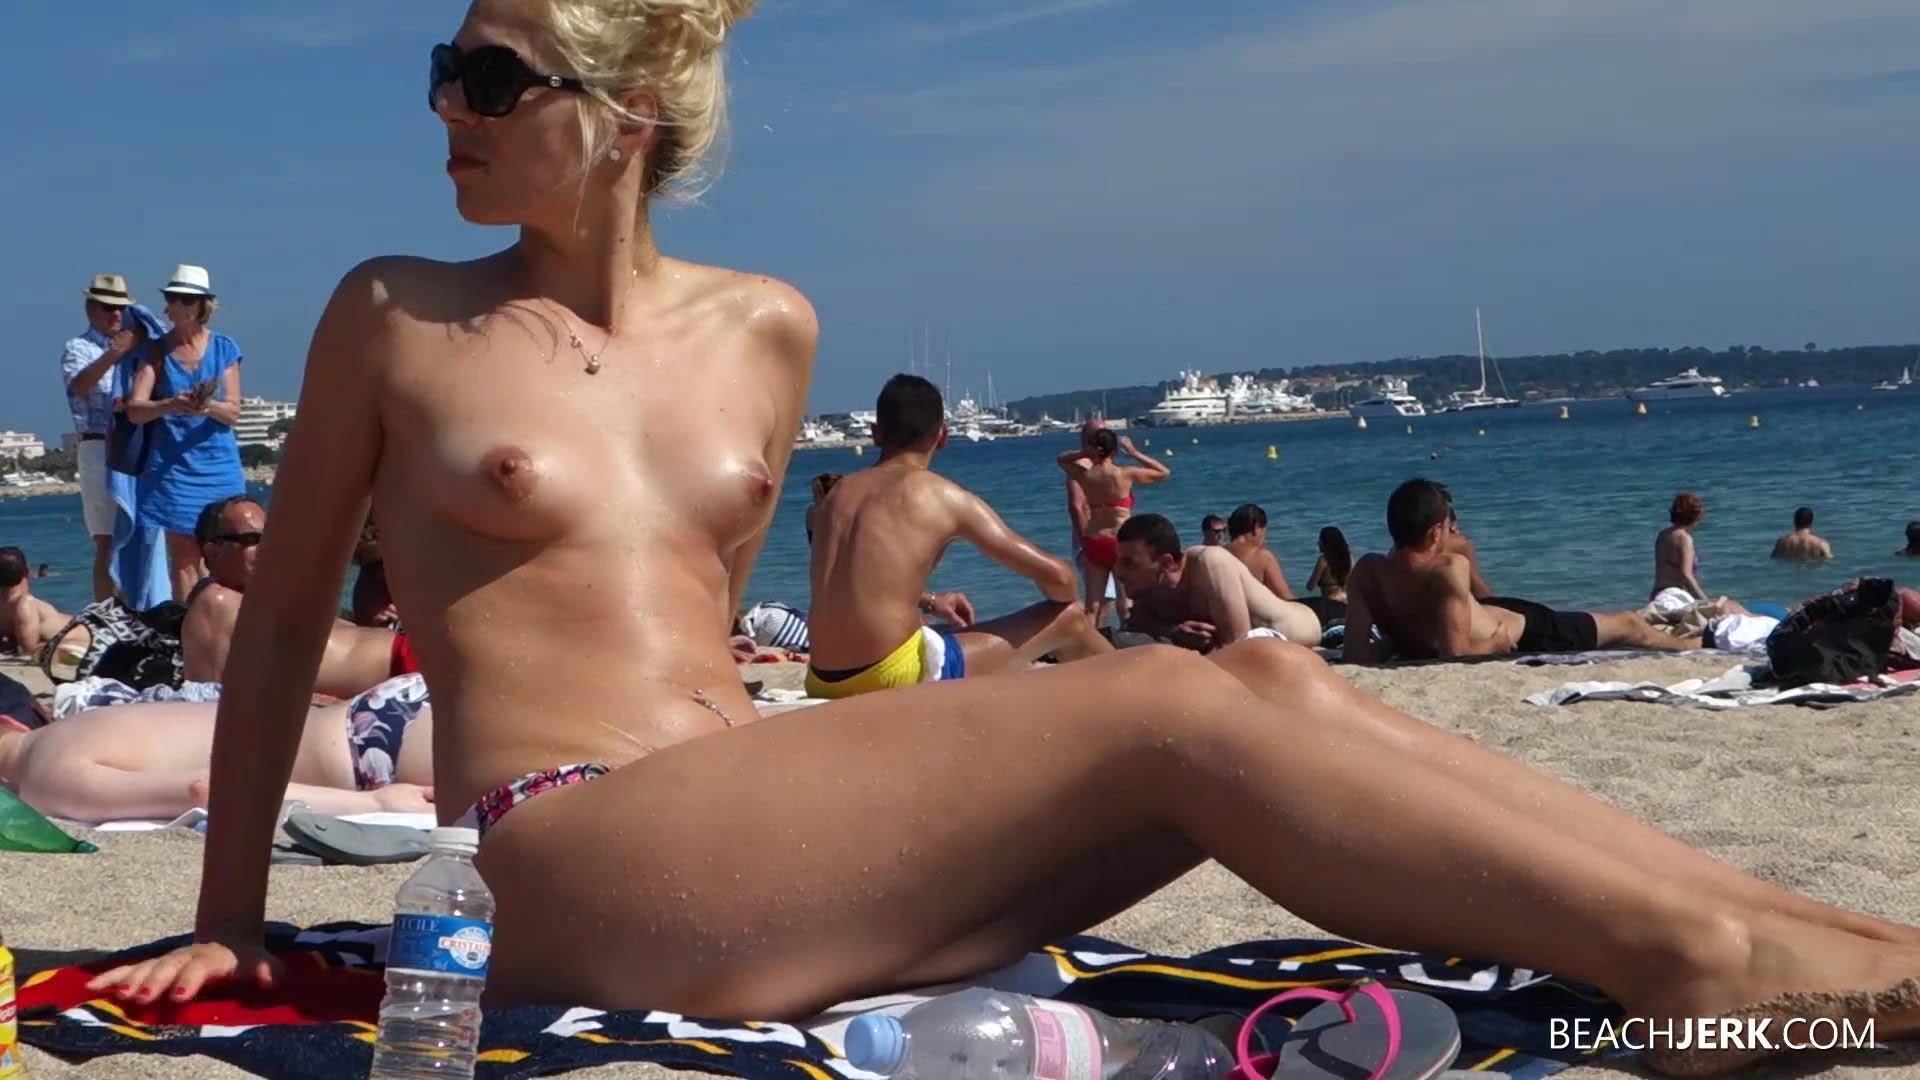 BikiniPleasurecom  Hot Girls at the Beach